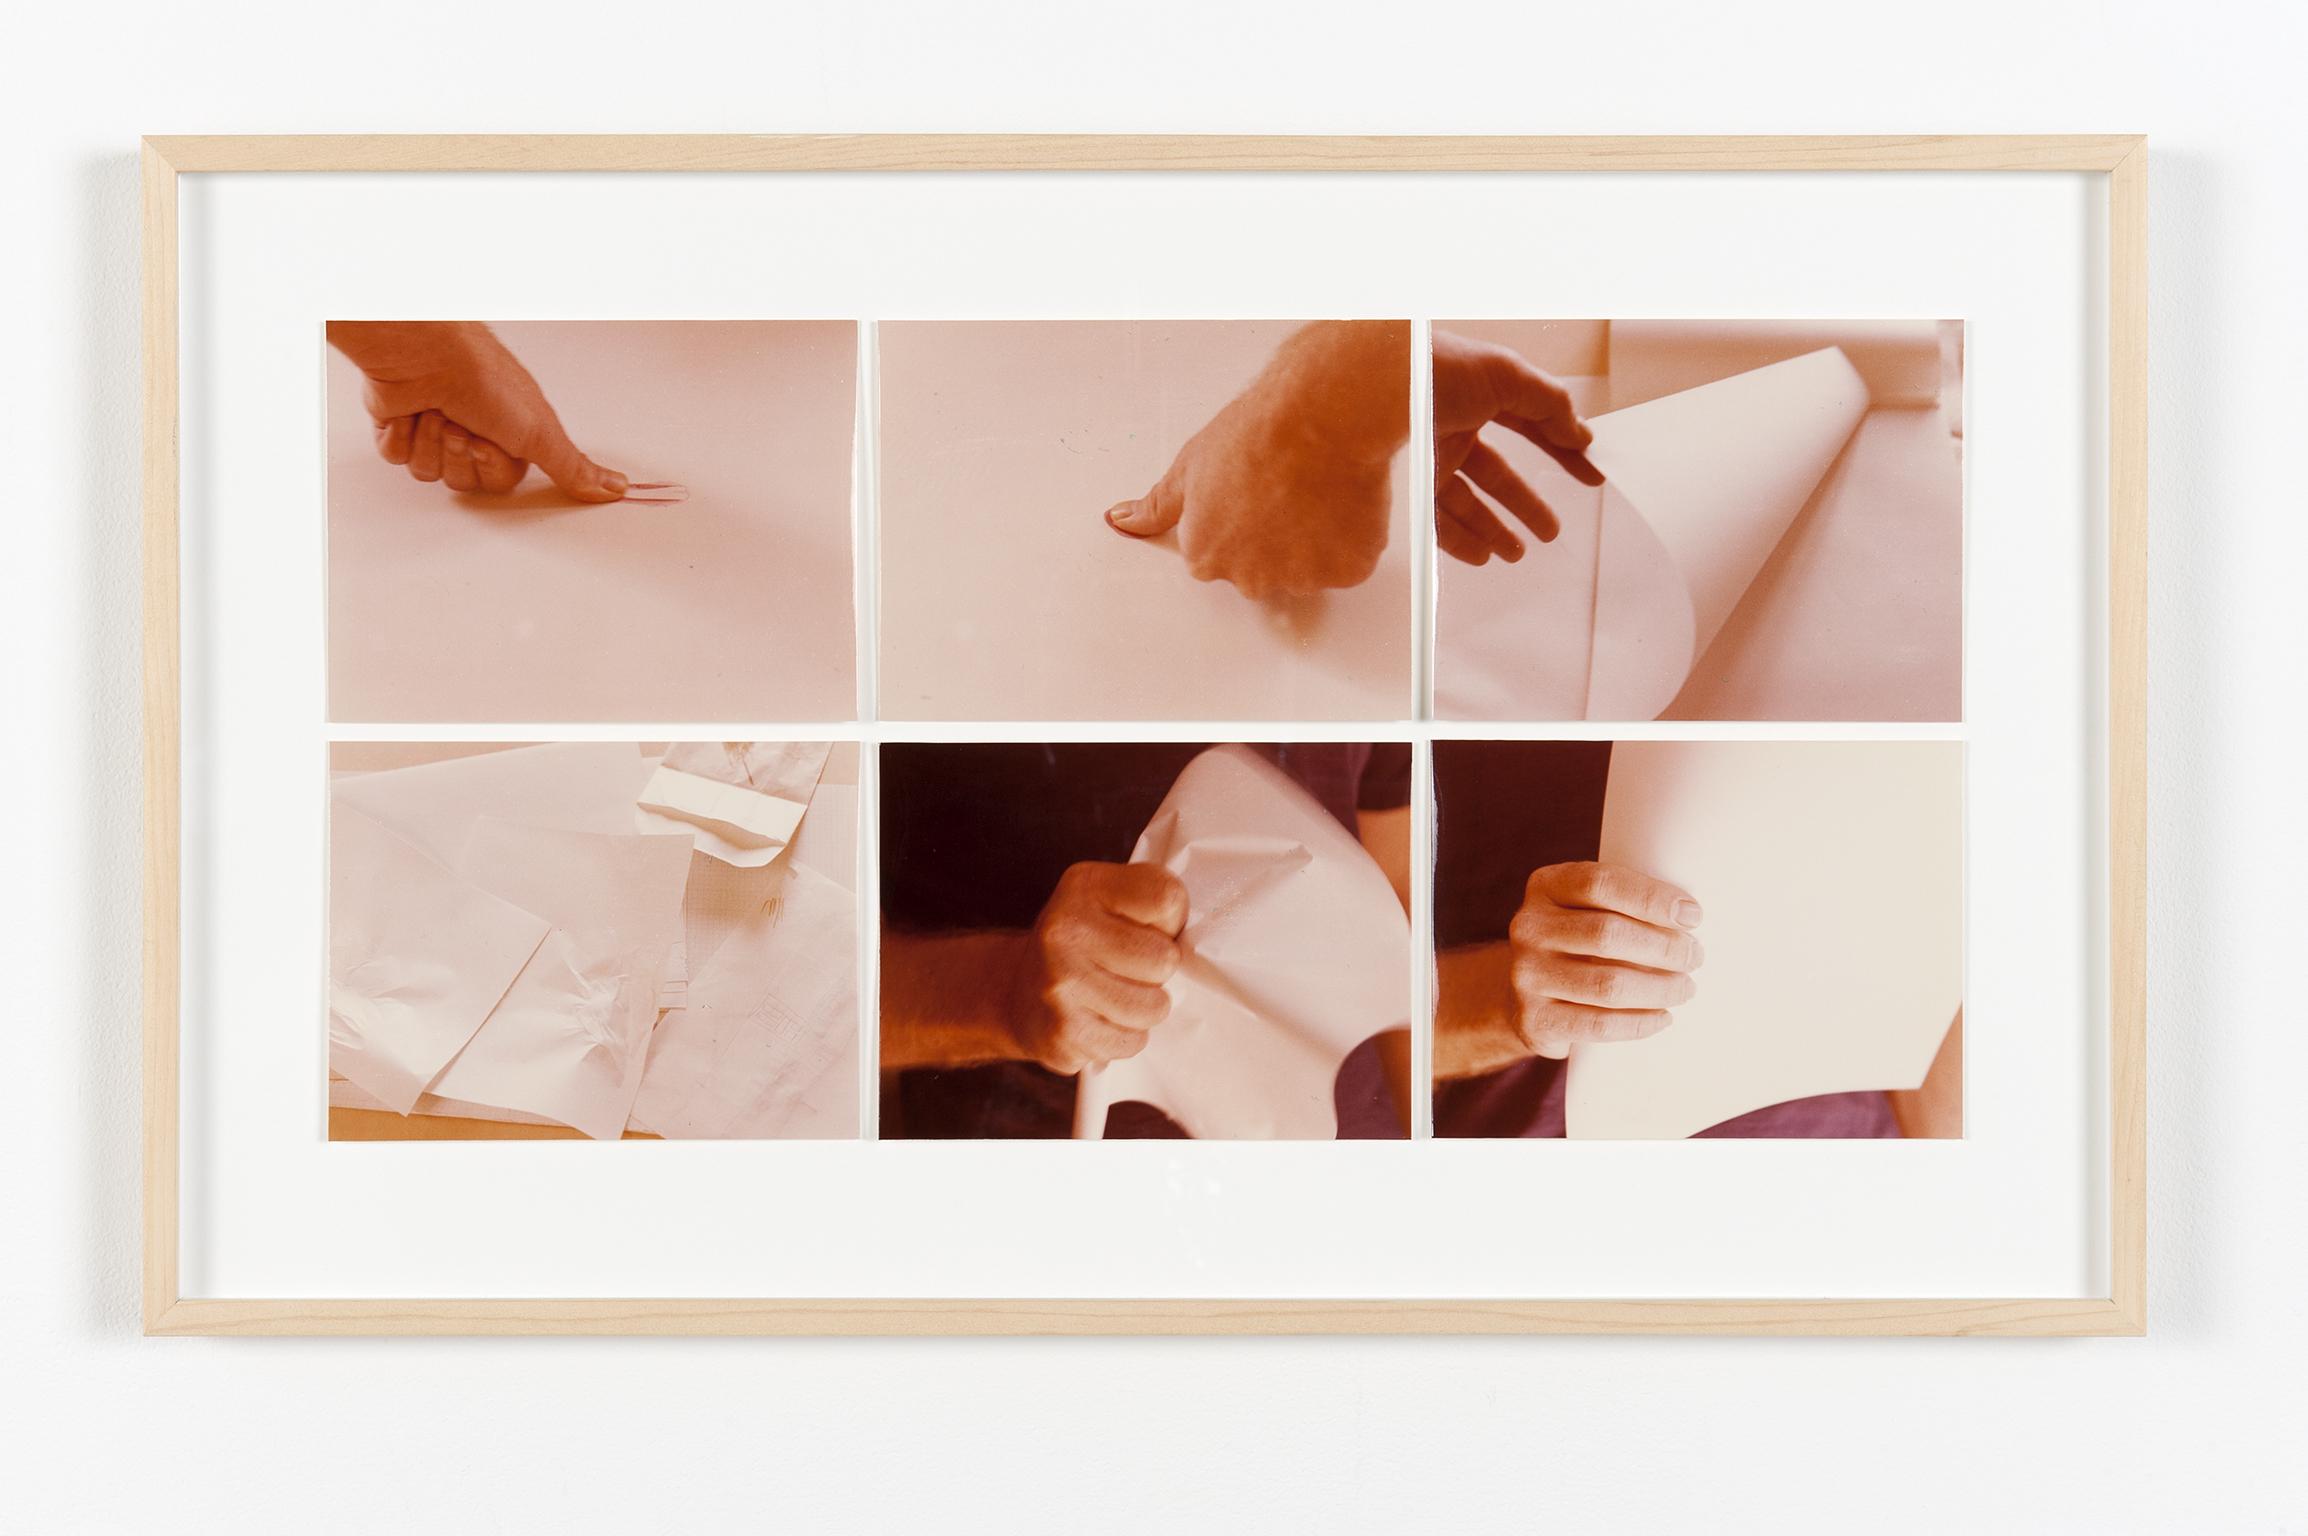 Robert Kleyn, Untitled, 1976–1977, colour photographs, 14 x 23 in. (36 x 58 cm) by